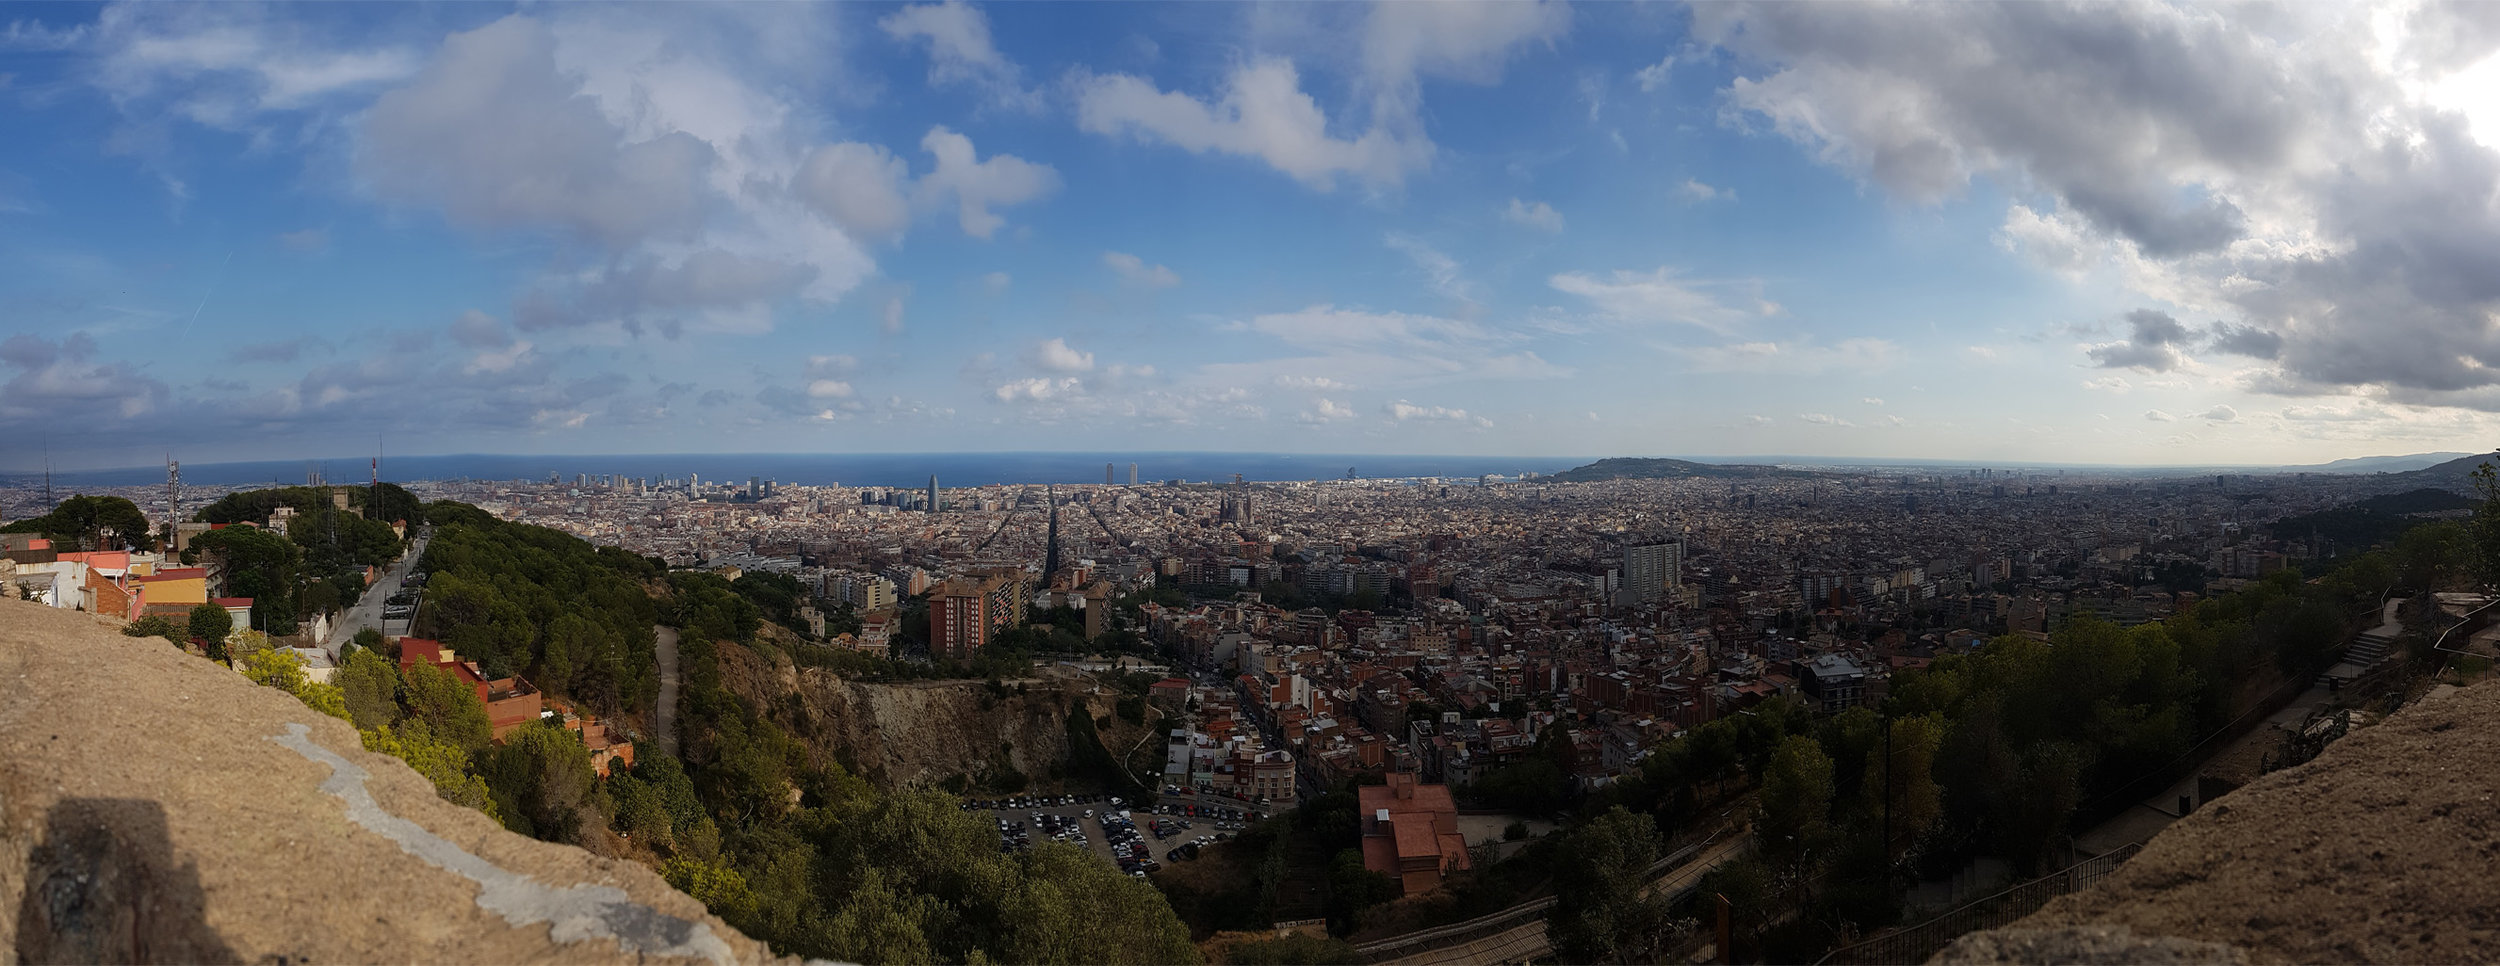 View from Turó de la Rovira